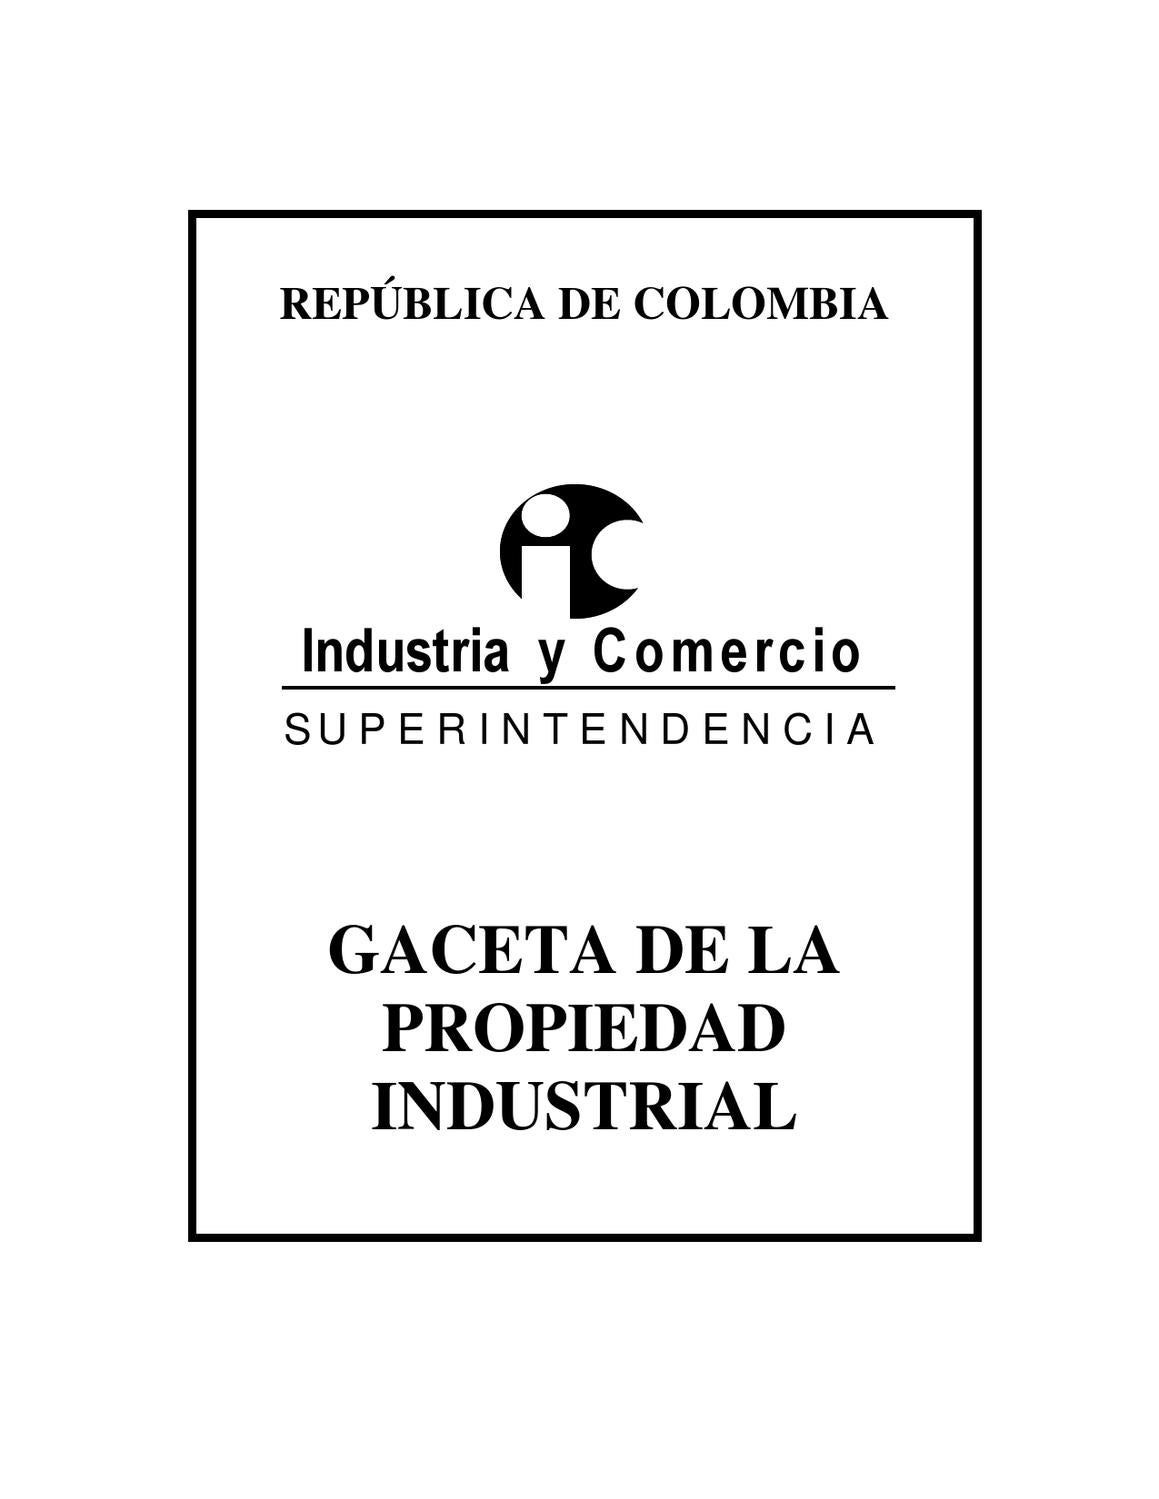 f1eb036b8680 Gaceta 649 de 2012 by Tecnologia Sic - issuu